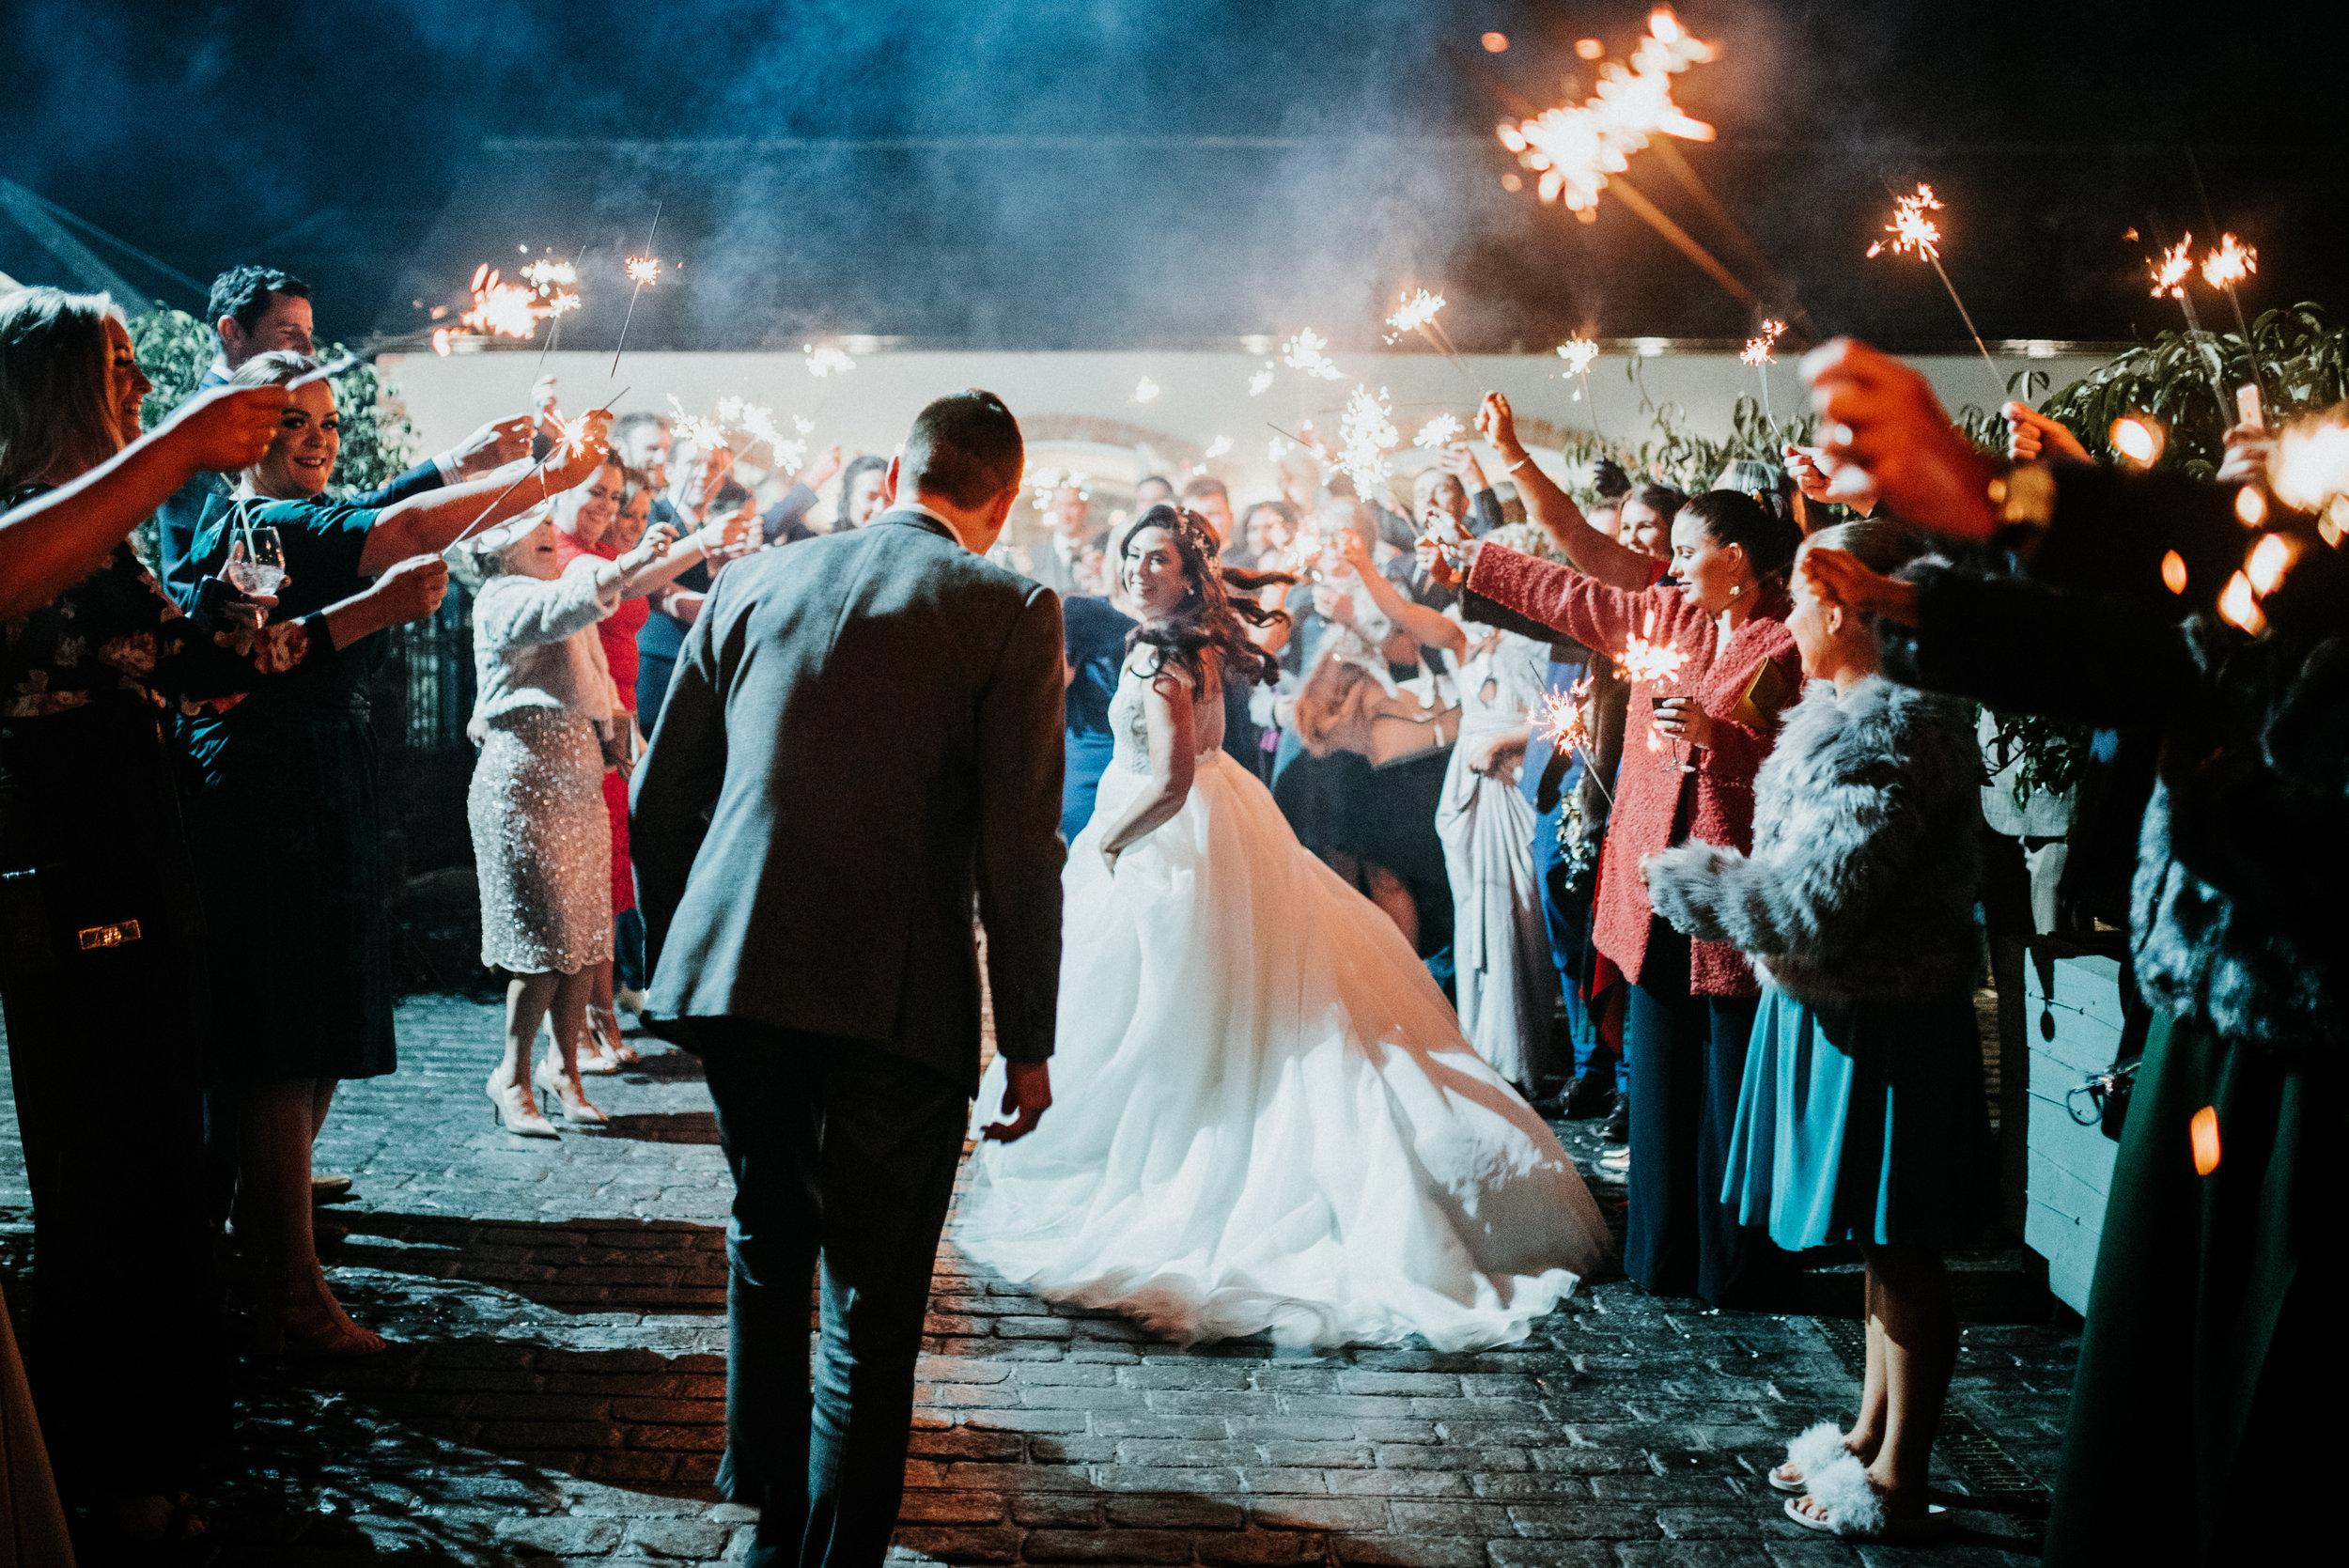 larchfield estate wedding, wedding venues northern ireland, barn wedding venues northern ireland, wedding photos larchfield estate, shane todd wedding, wedding sparklers, irish wedding (3).jpg